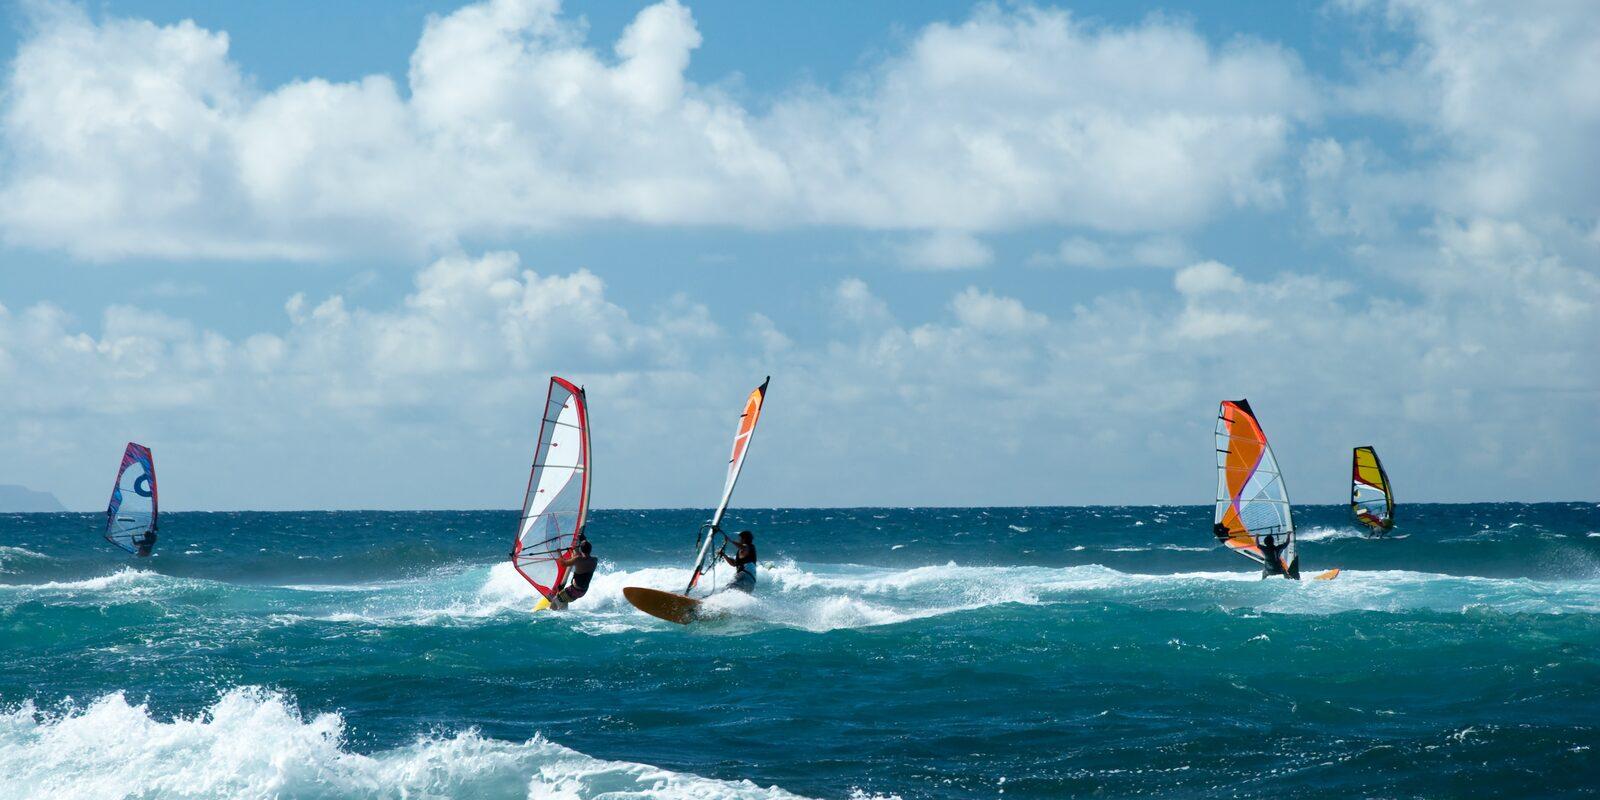 Centro de windsurf de Jibe City